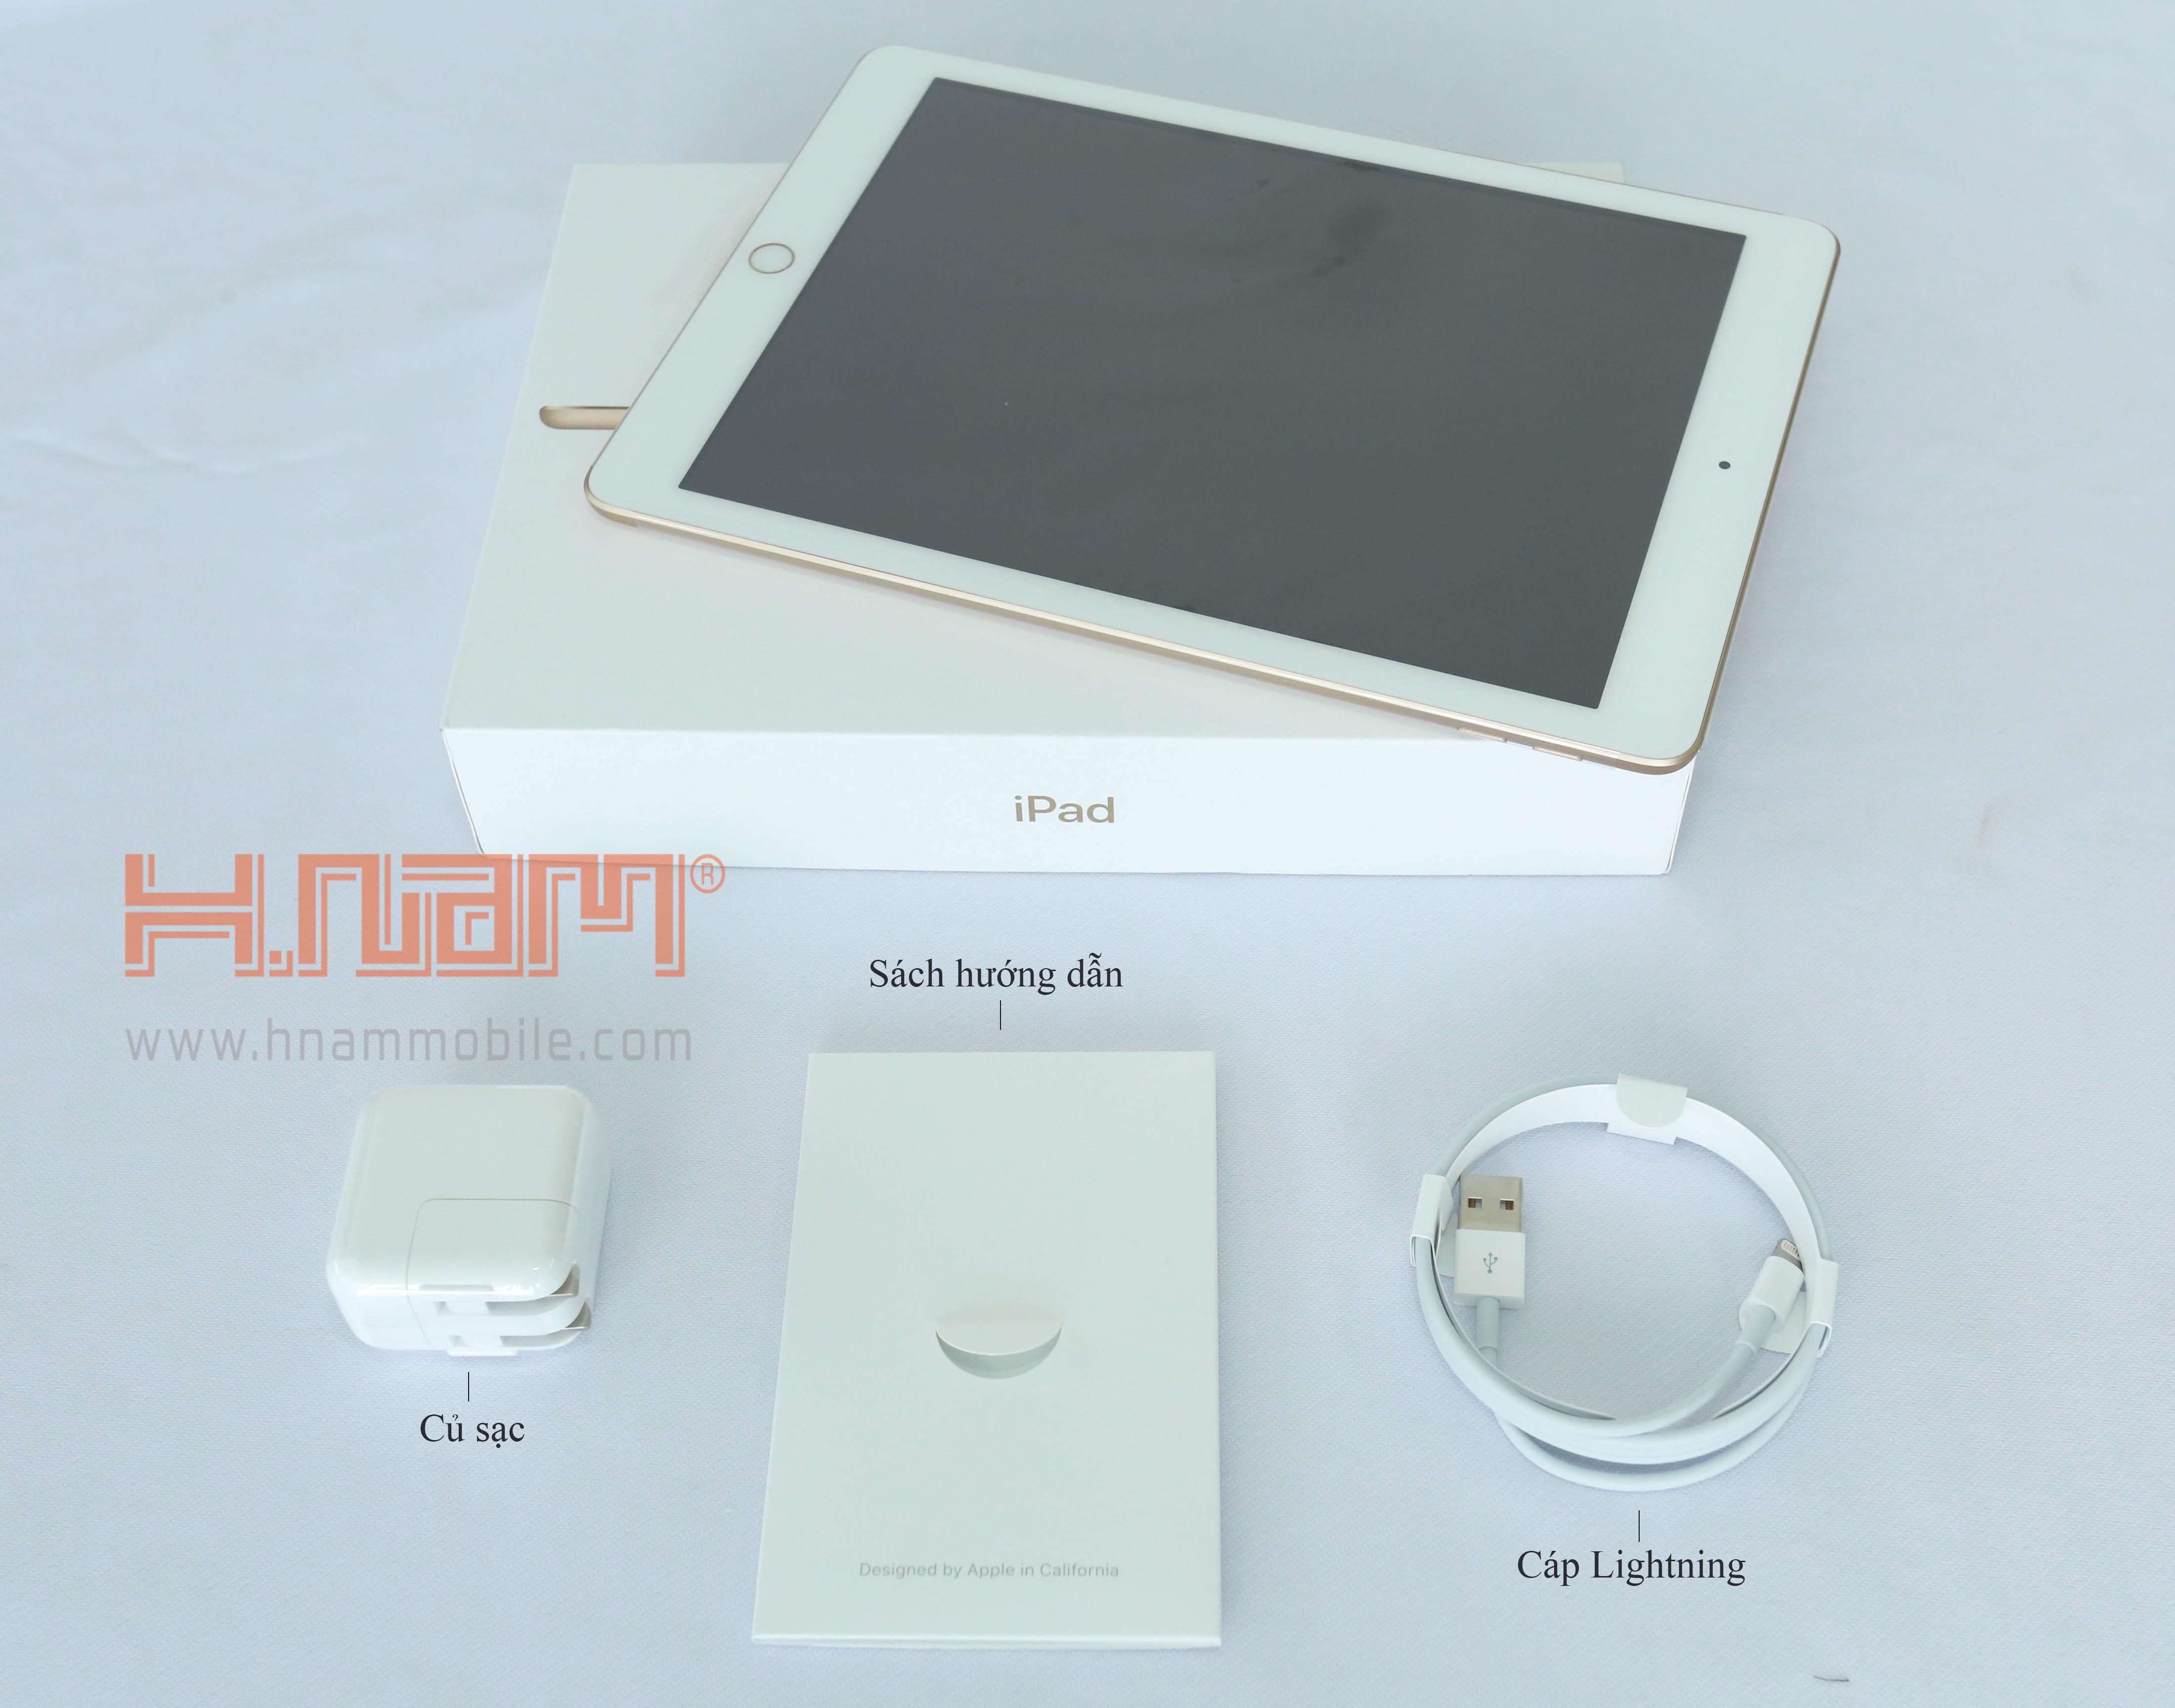 Apple iPad Gen 5 (2017) Cellular 128Gb hình sản phẩm 0